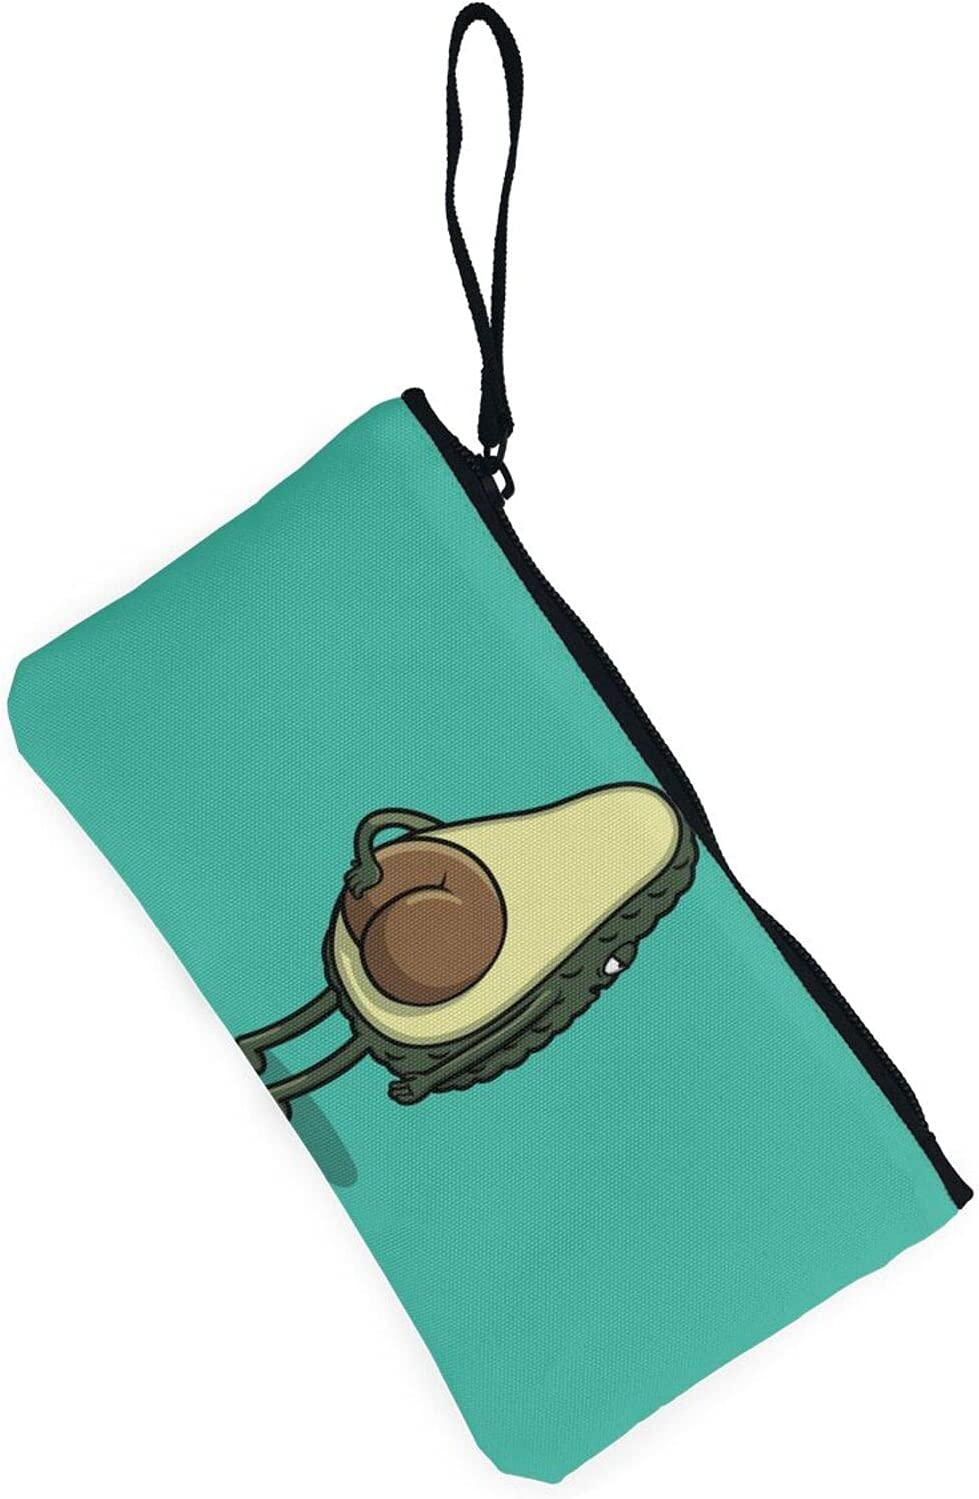 AORRUAM Cute Avocado Anime Canvas Coin Purse,Canvas Zipper Pencil Cases,Canvas Change Purse Pouch Mini Wallet Coin Bag